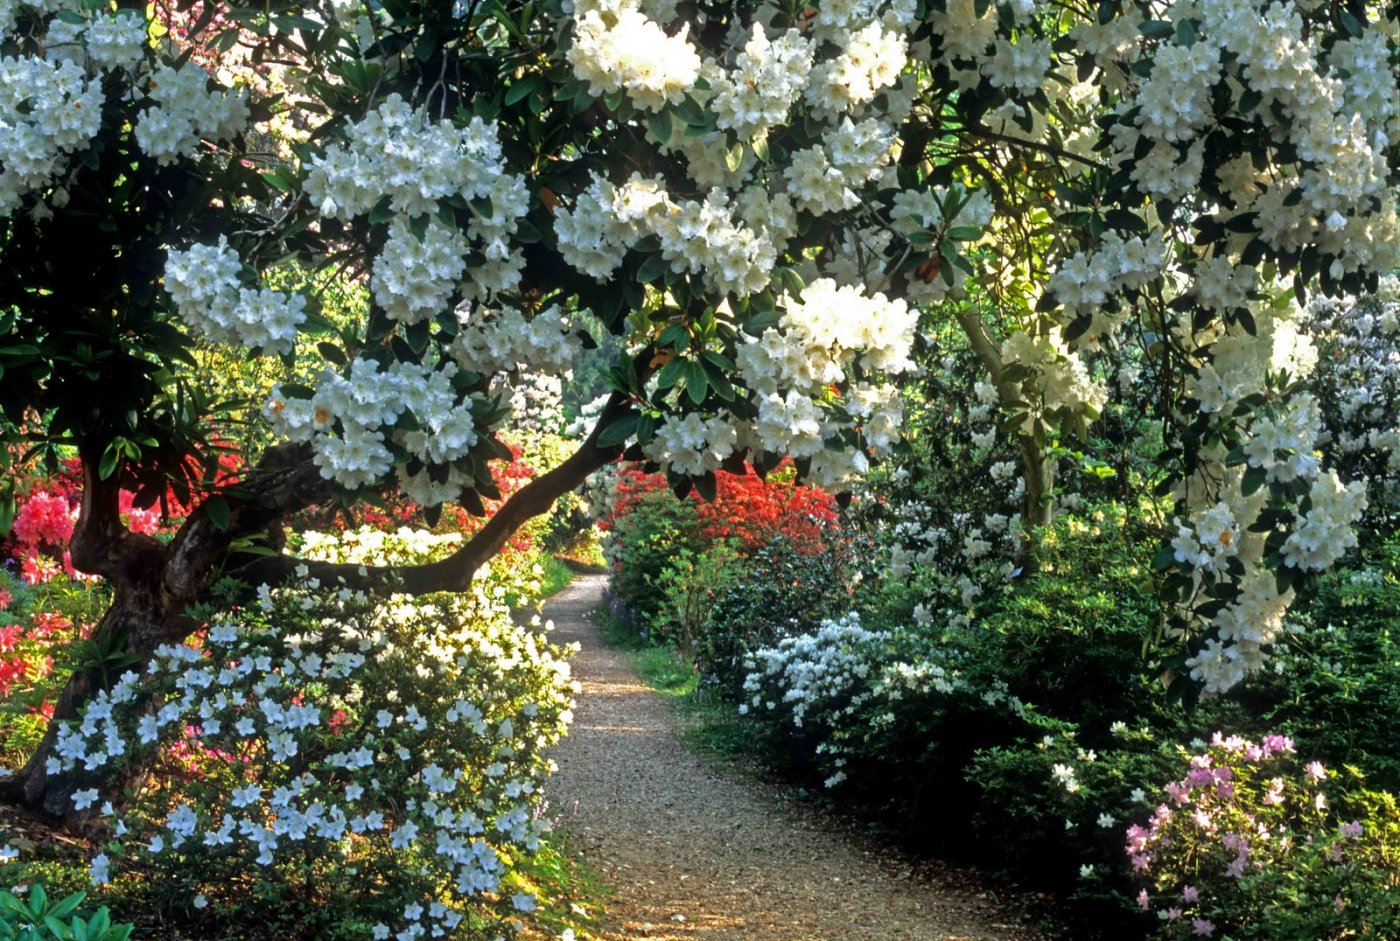 sadyi_leonardsli_leonardslee_gardens_ (1).jpg